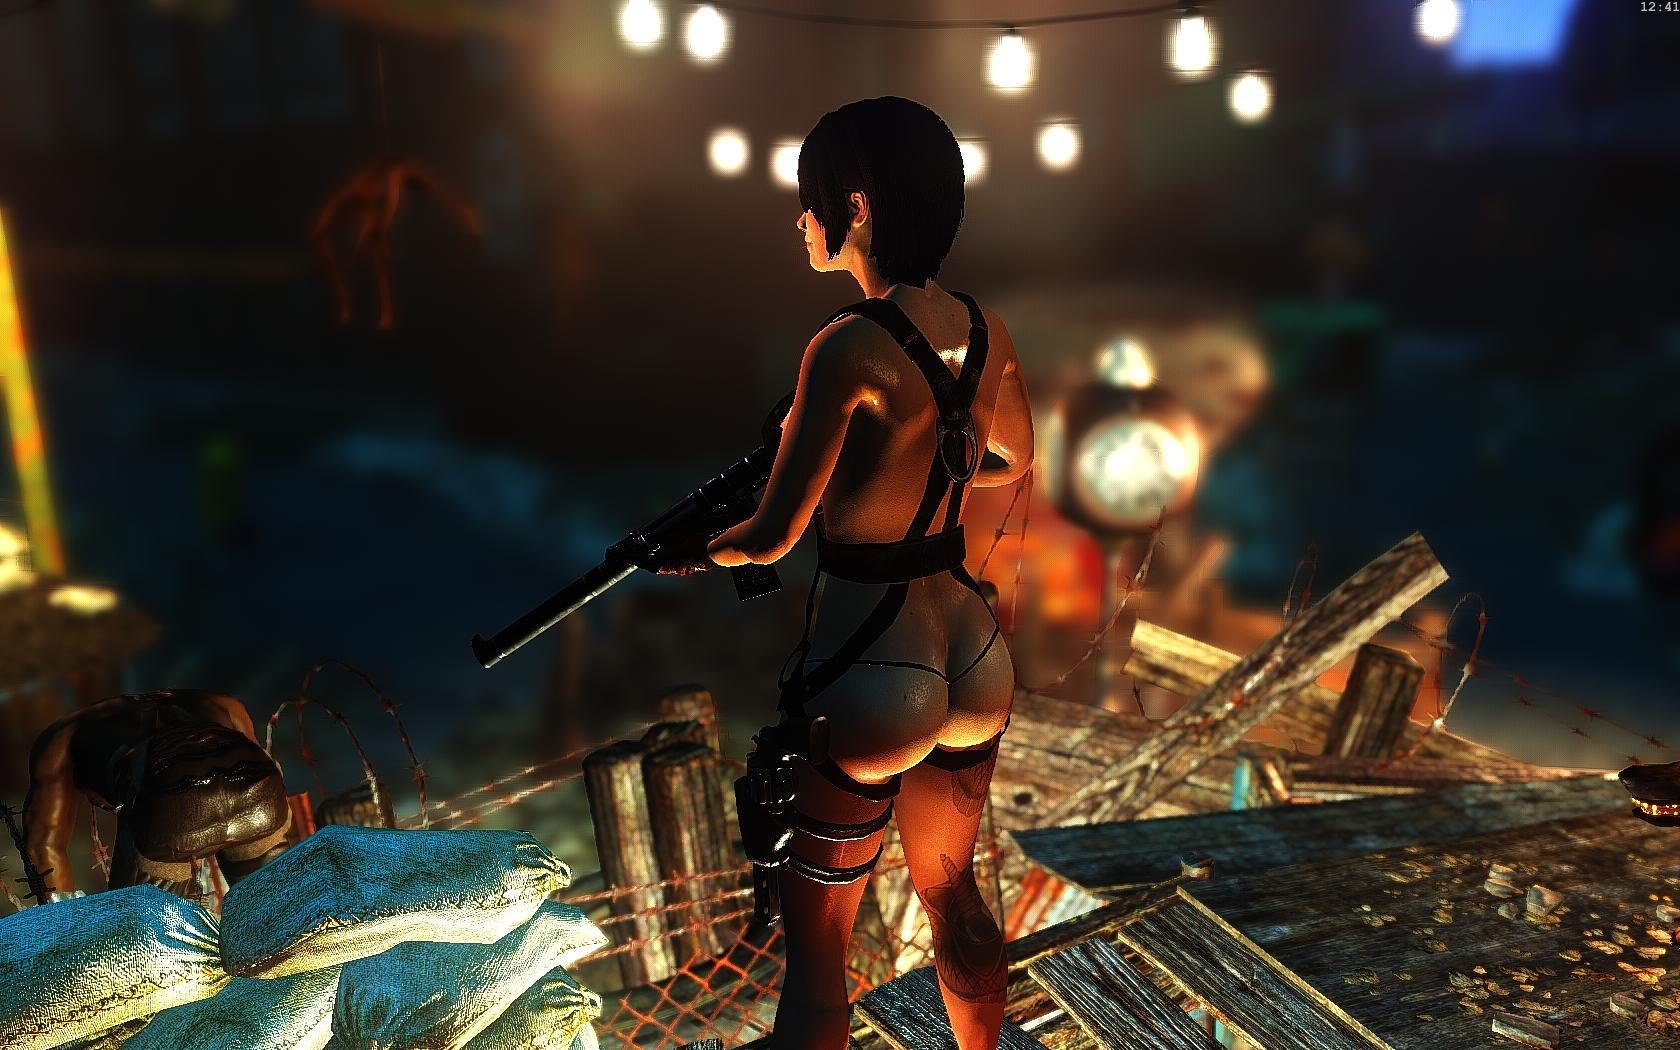 Fallout4 2019-03-04 12-41-46-62